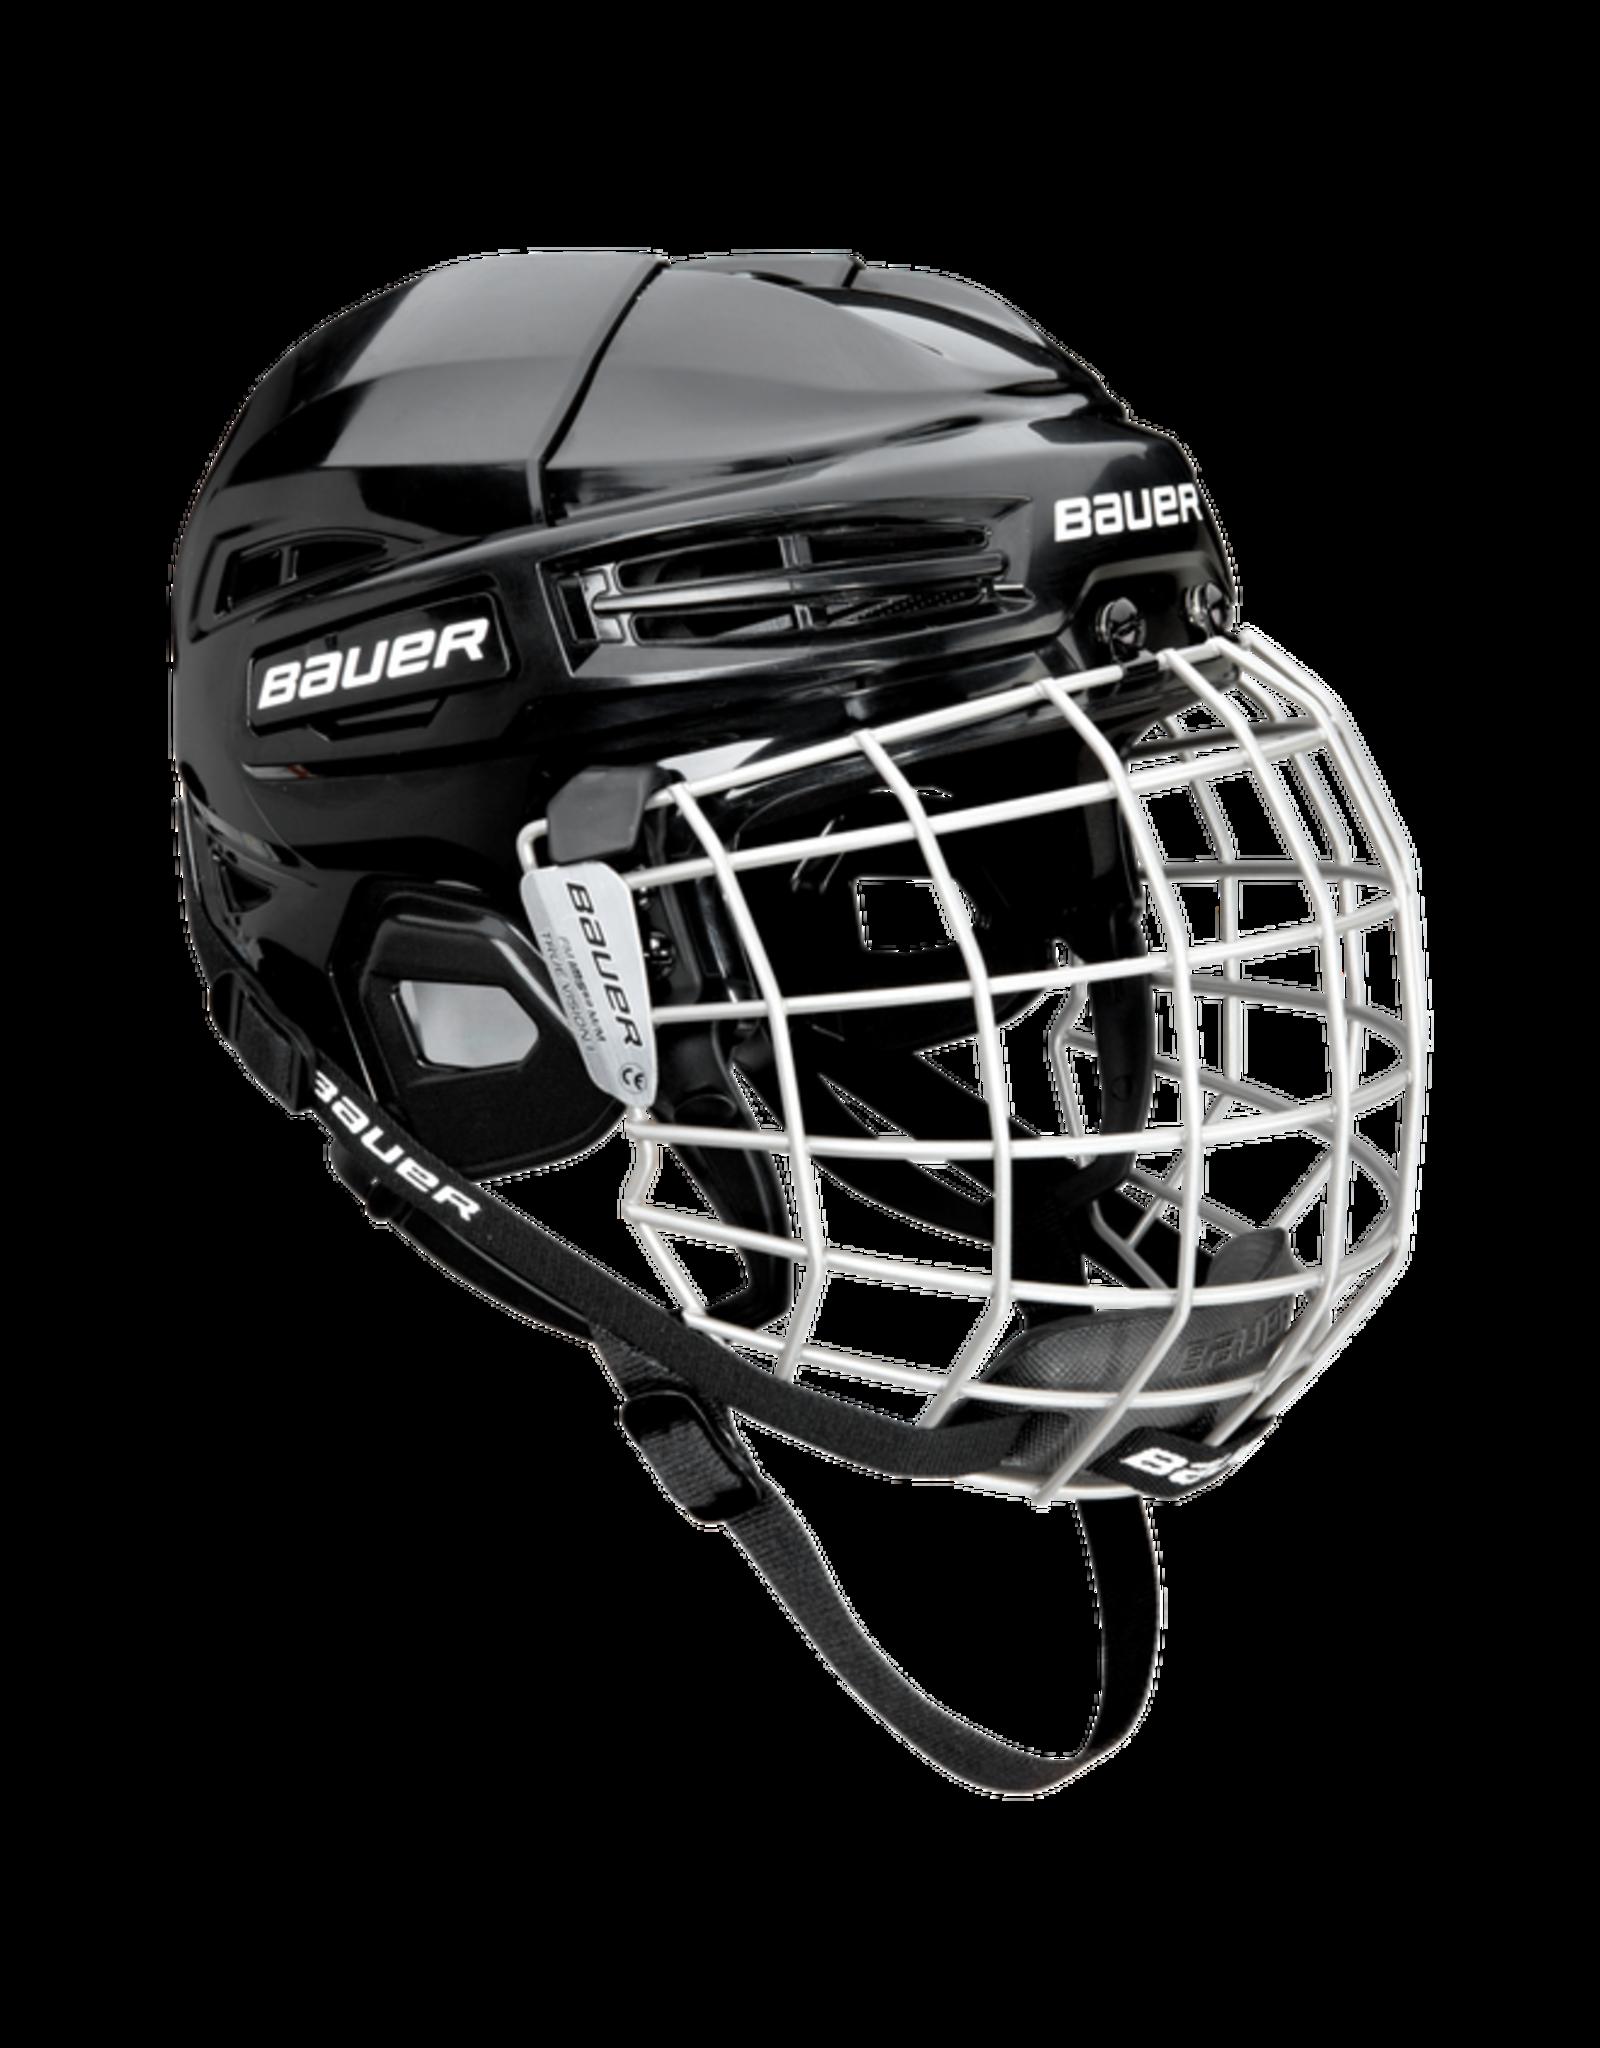 Bauer Hockey - Canada BAUER IMS 5.0 HELMET COMBO